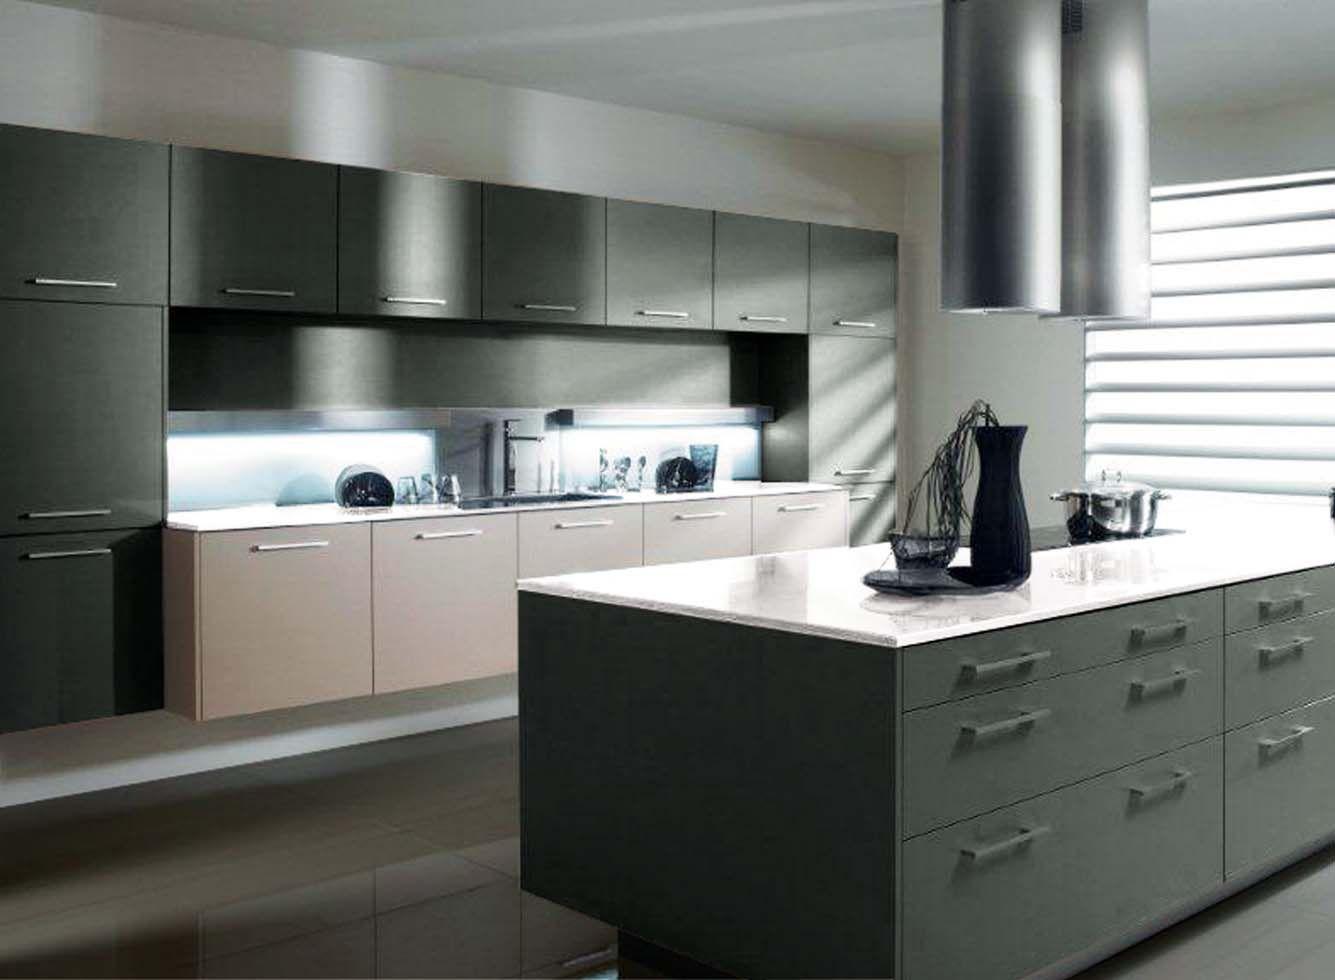 Cocina 82 cocinas capis dise o y fabricaci n de cocinas for Configurador de cocinas